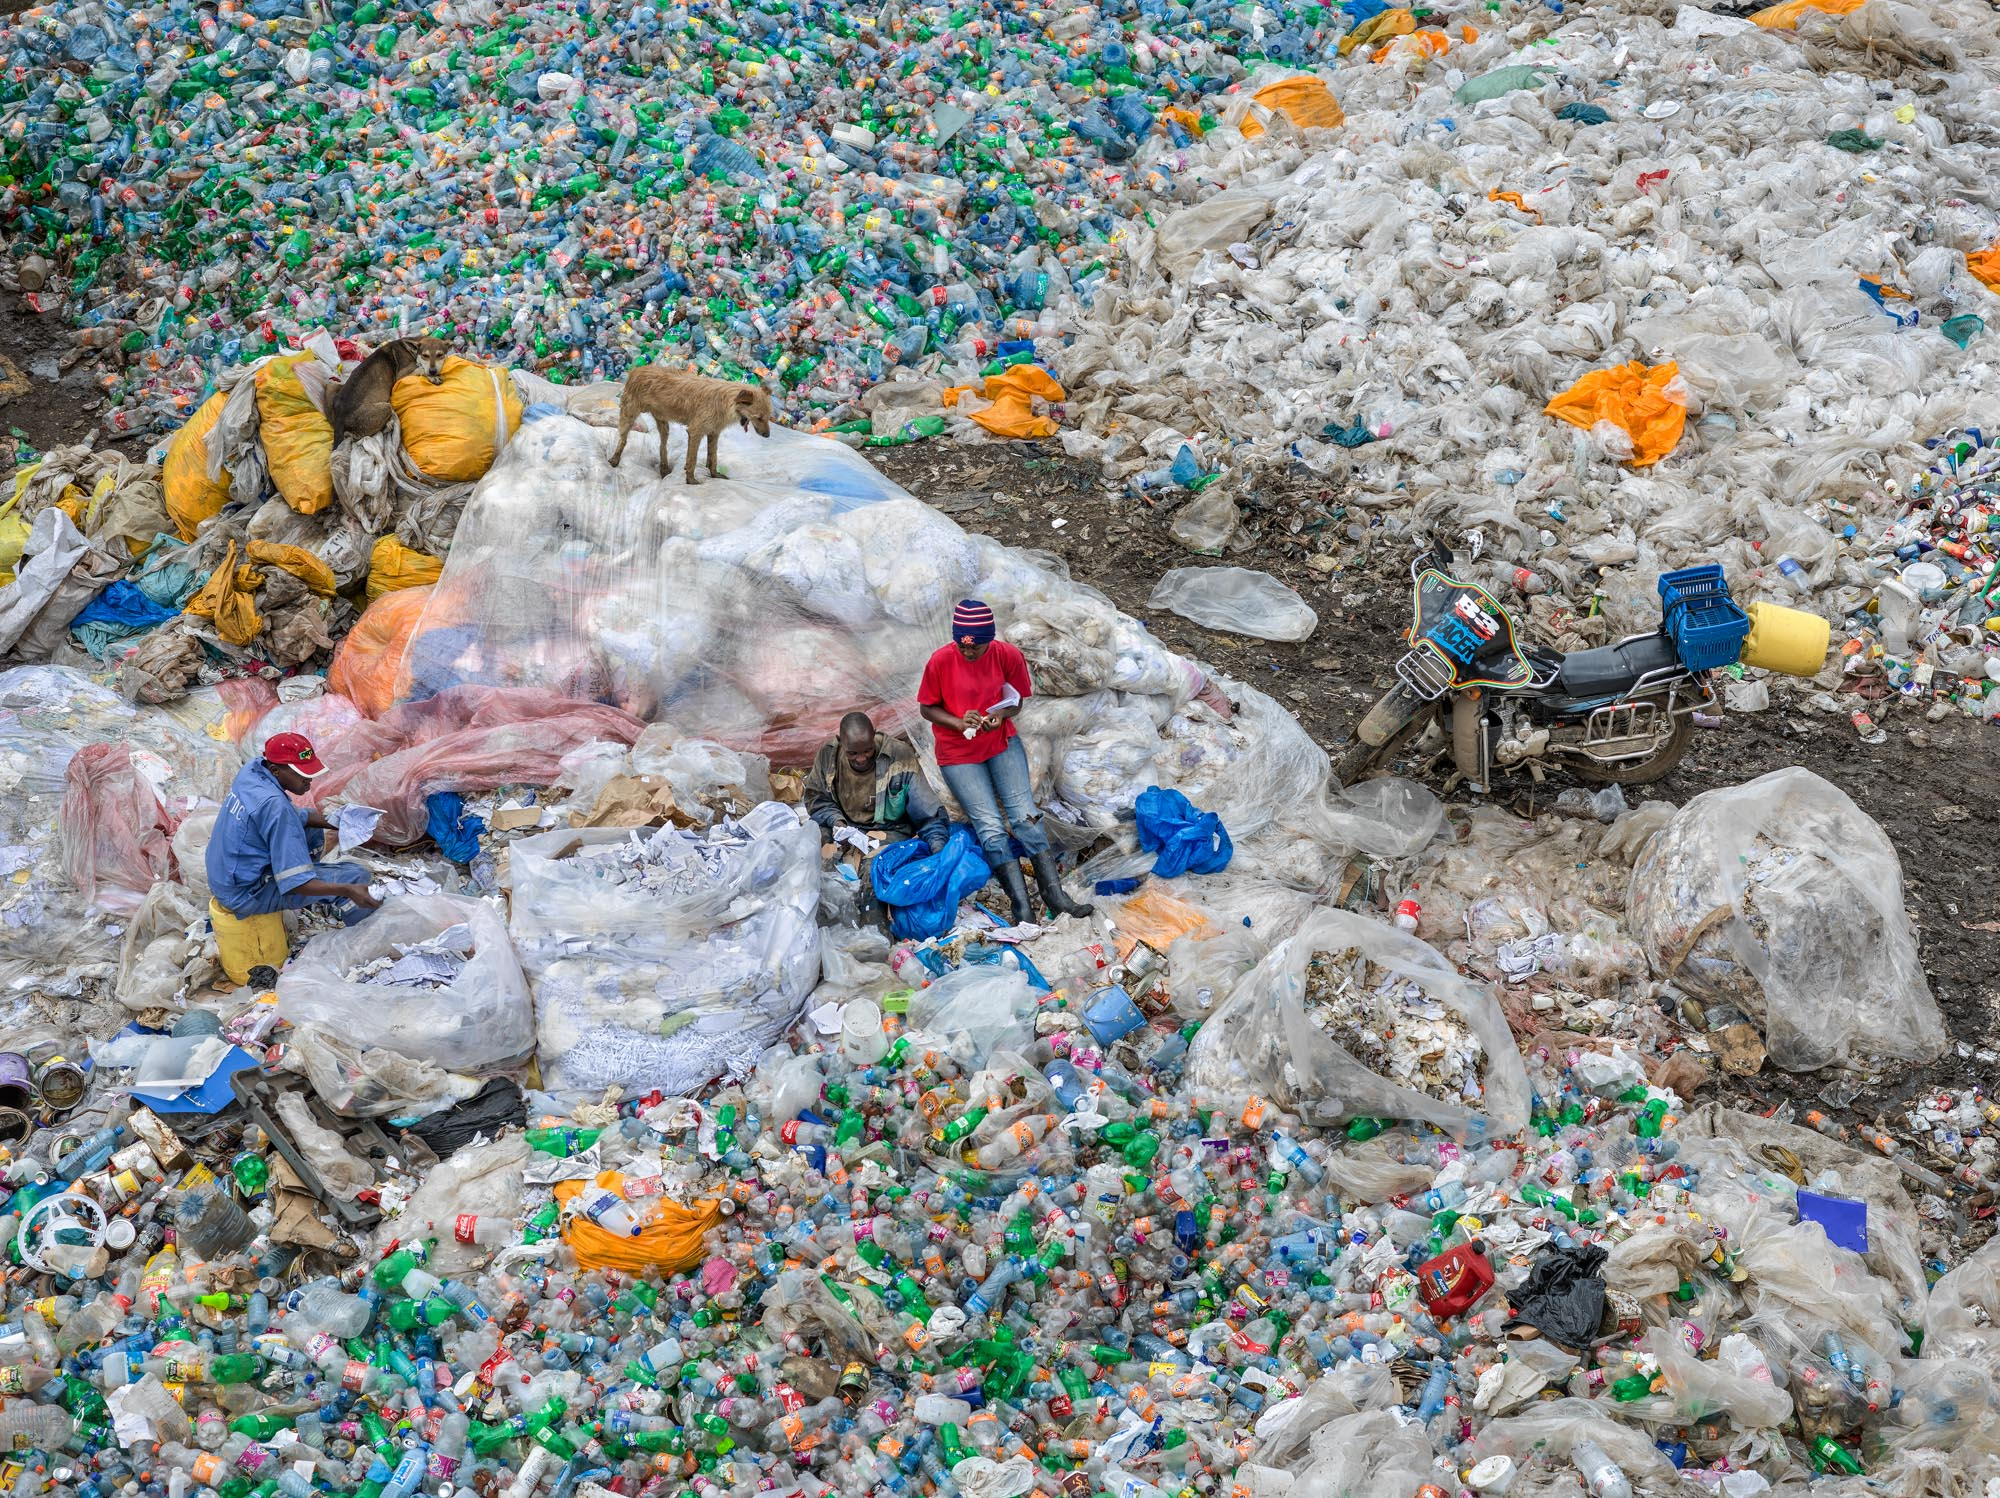 Dandora Landfill #3, Plastics Recycling, Nairobi, Kenya 2016 © Edward Burtynsky, courtesy Flowers Gallery, London / Howard Greenberg and Bryce Wolkowitz Galleries, New York